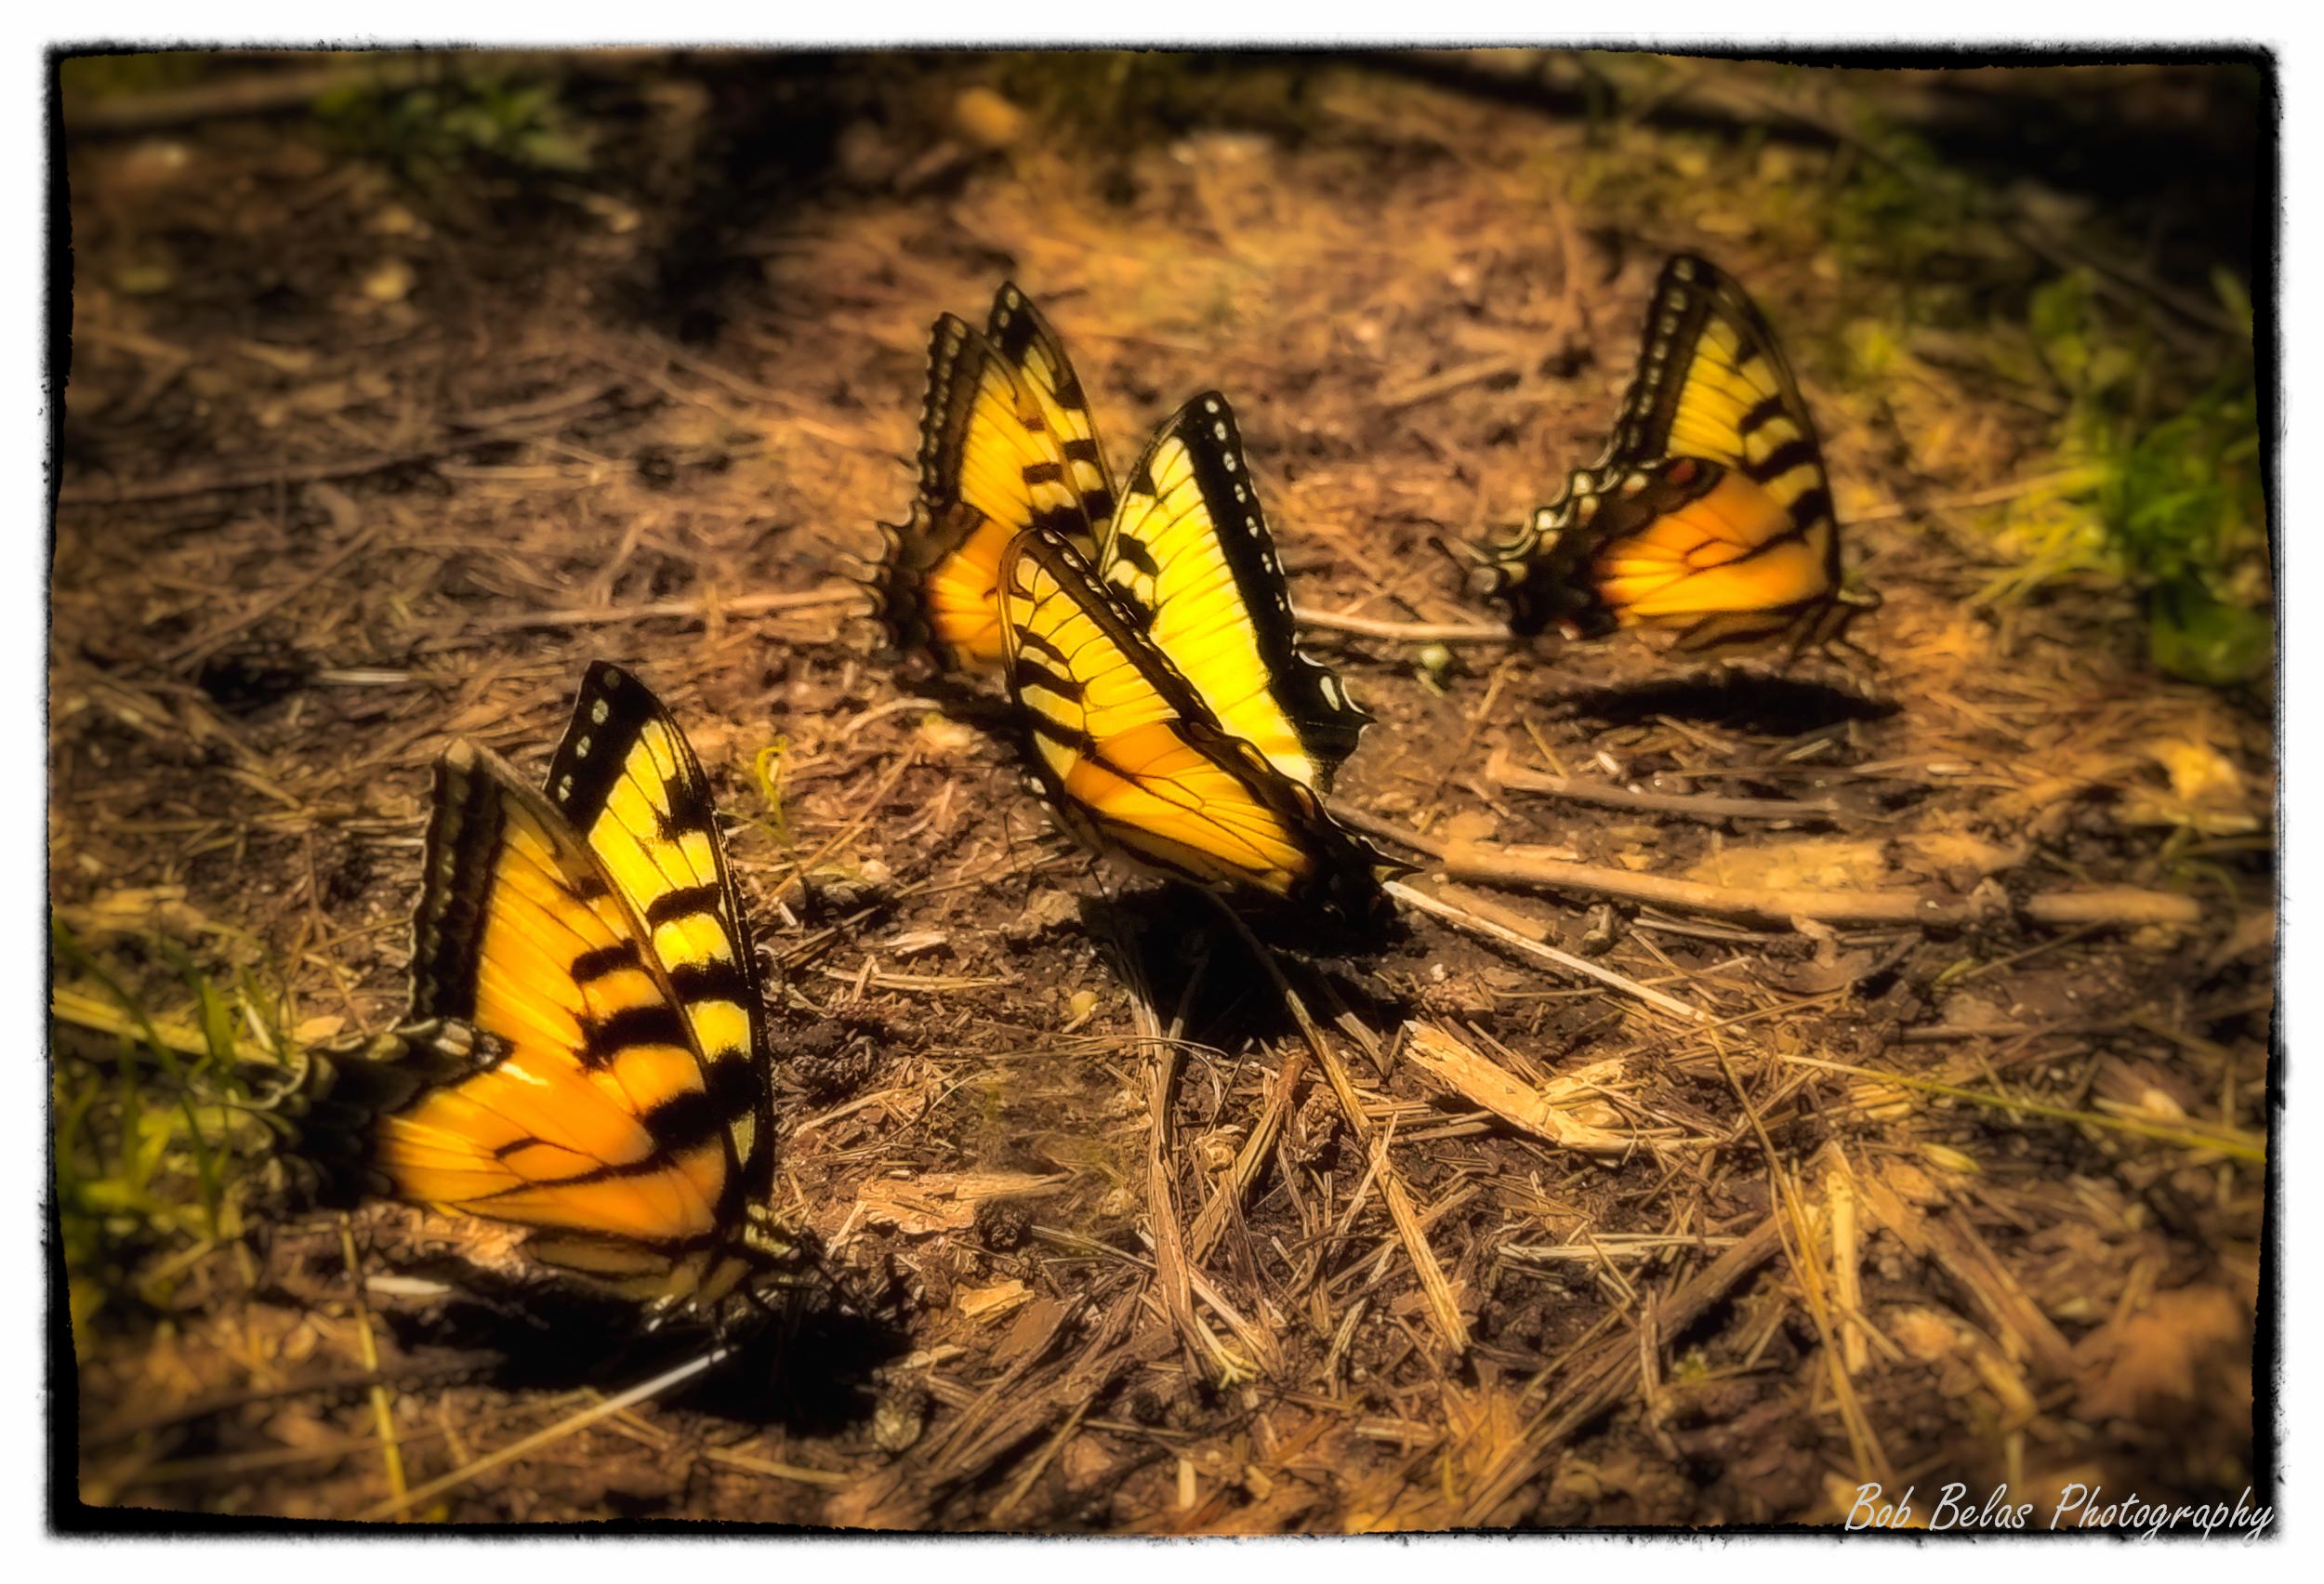 Illuminated butterflies, color